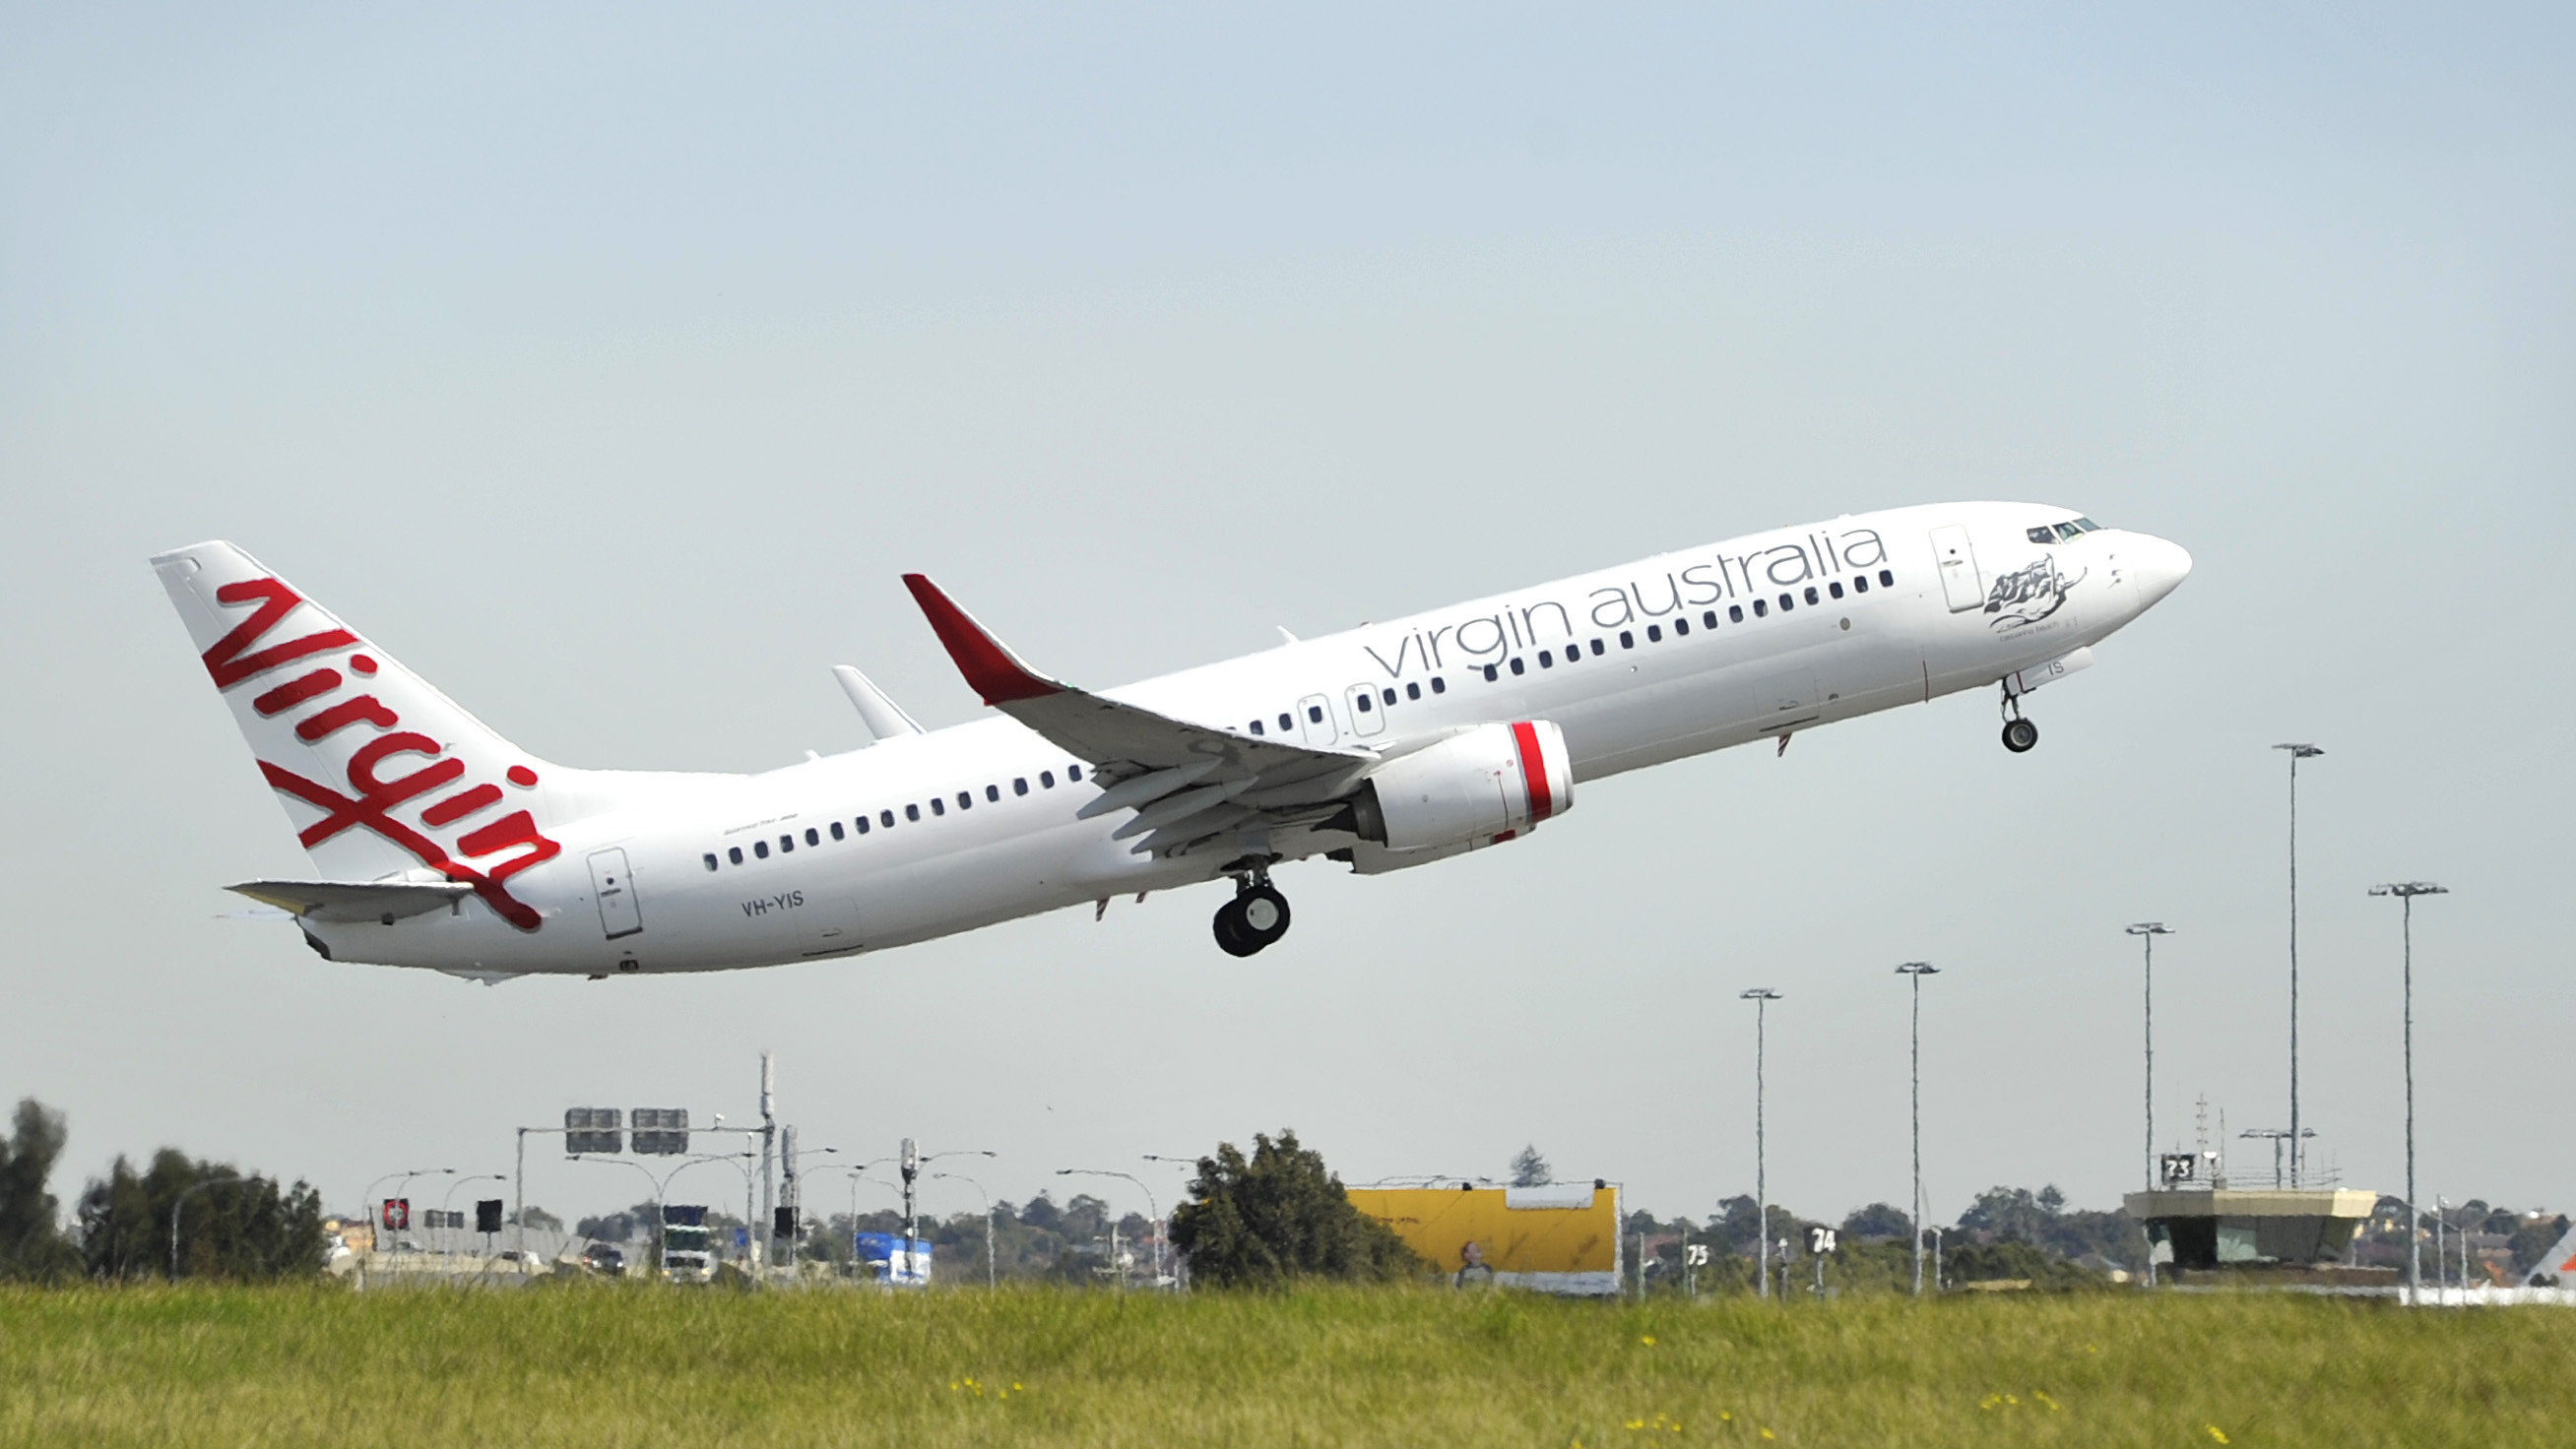 Virgin Australia systems resume following earlier error